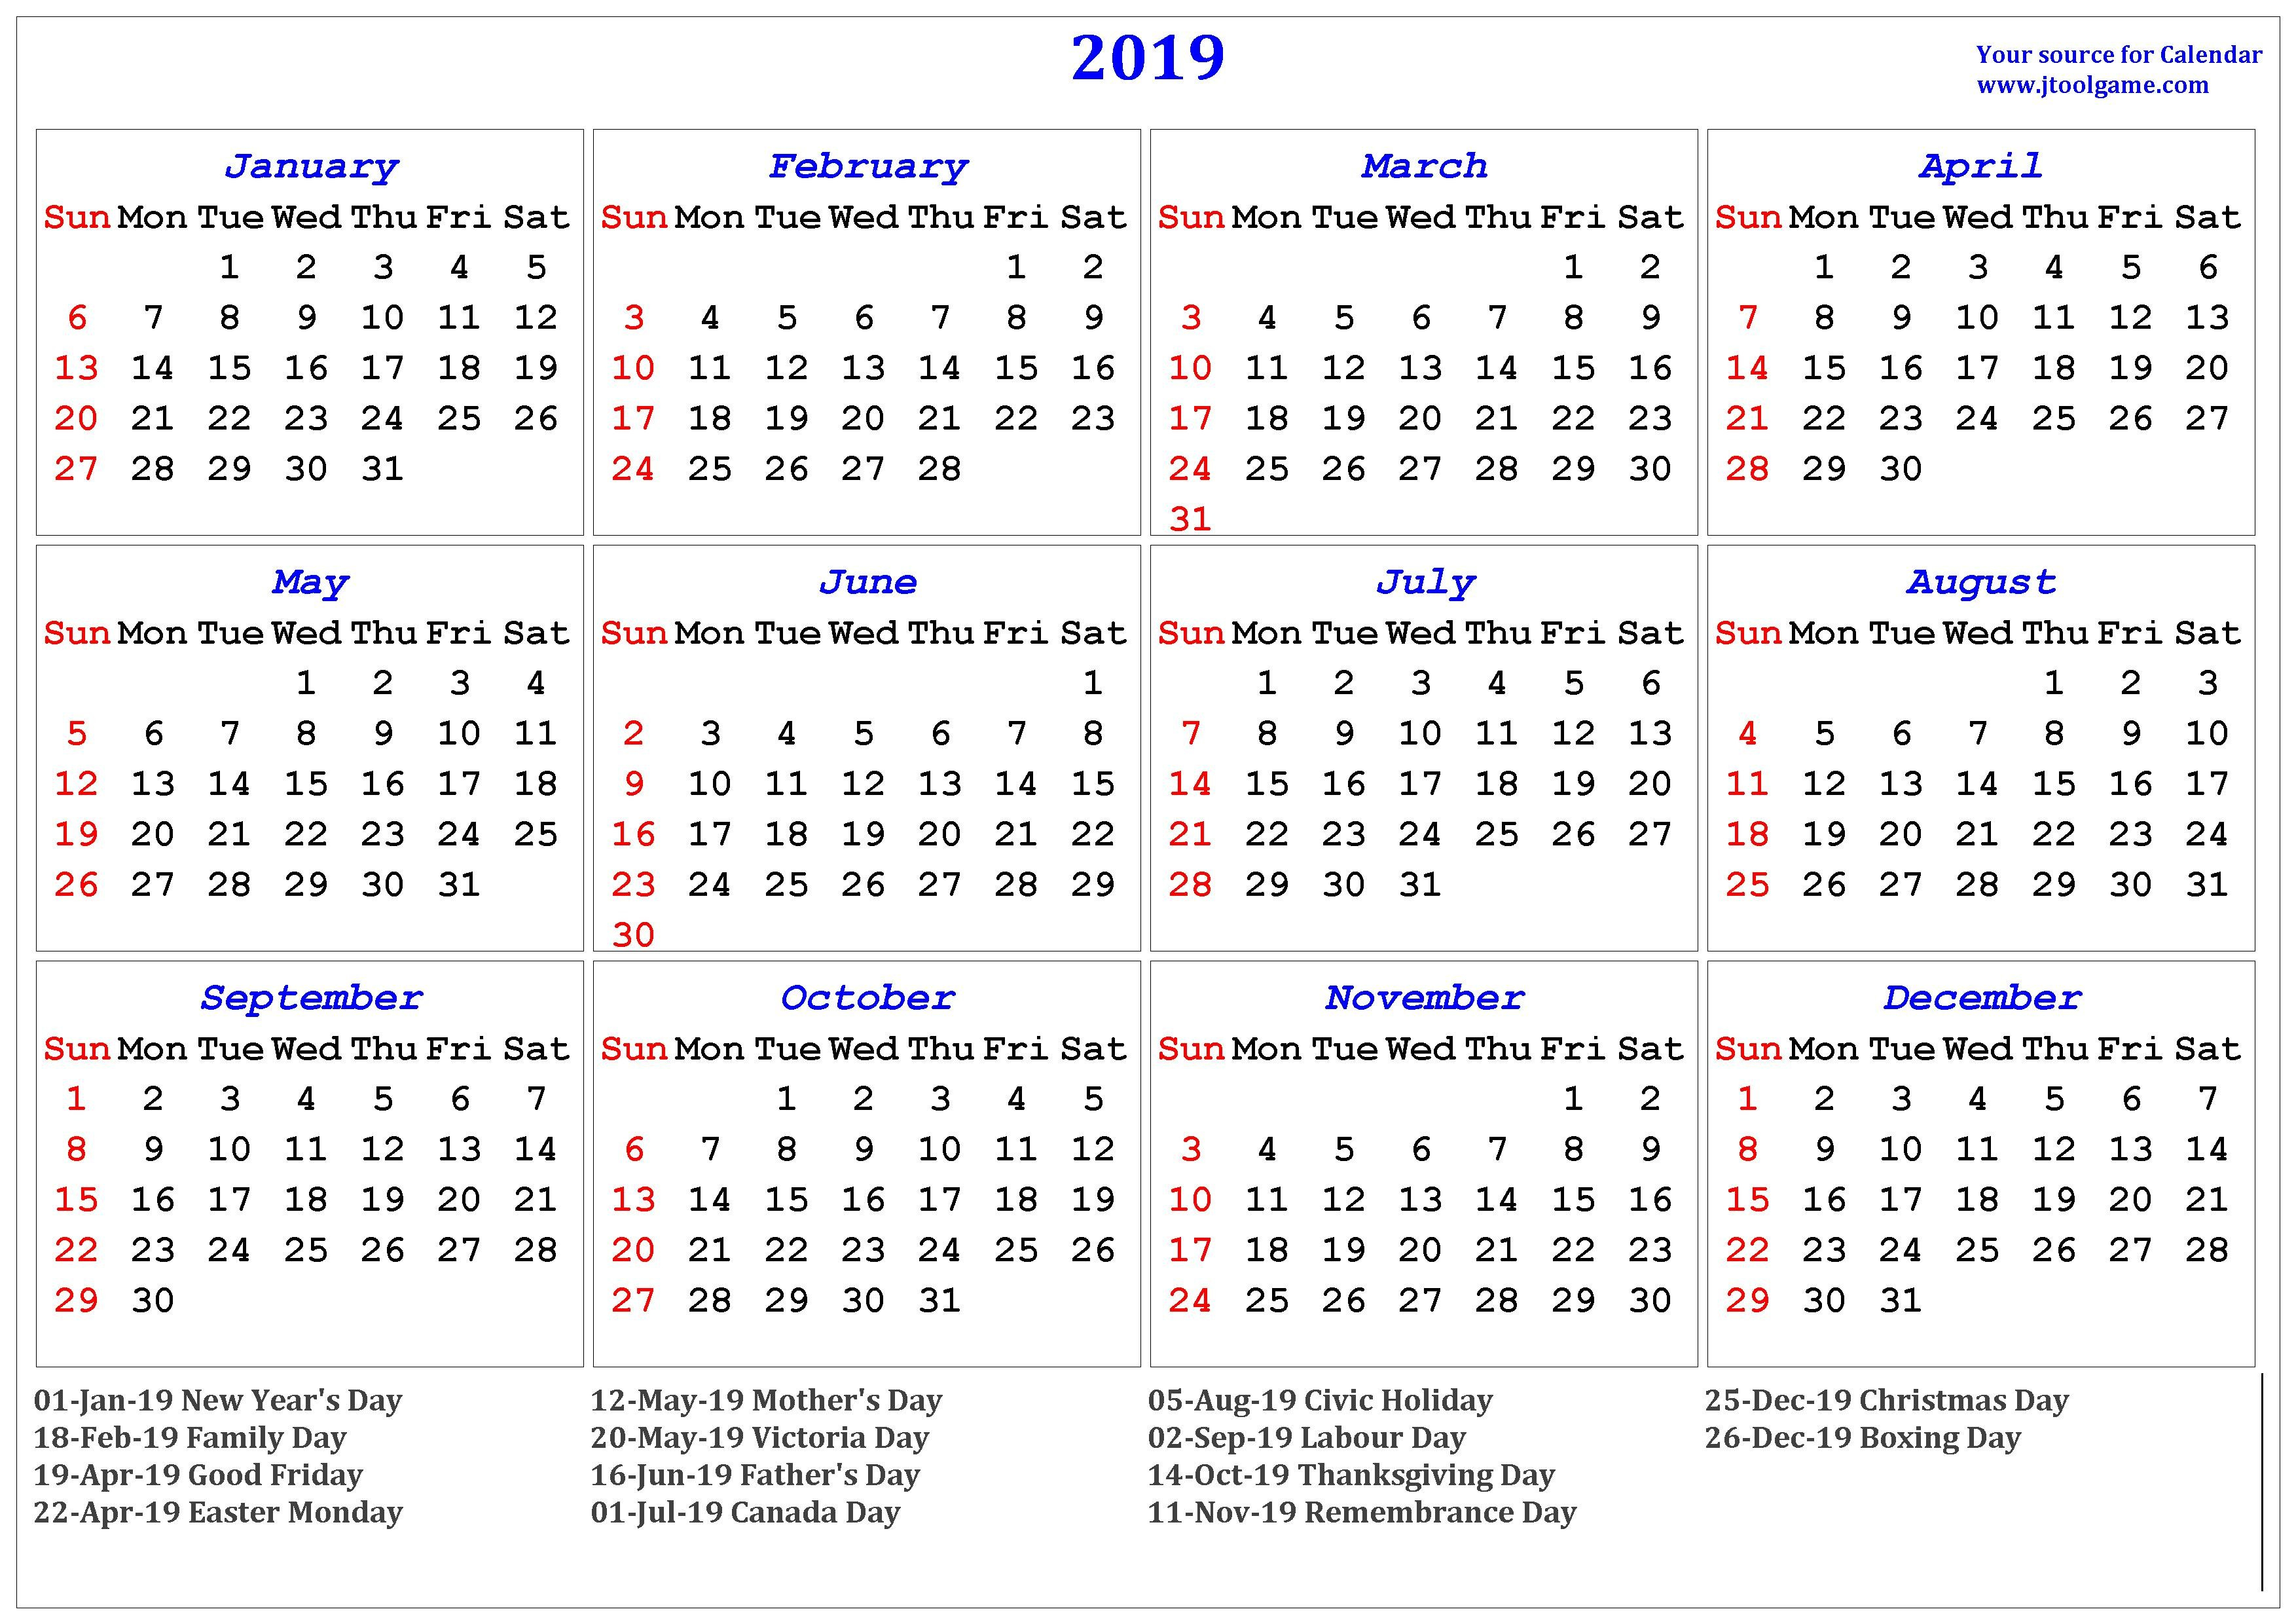 2019 Calendar - Printable Calendar. 2019 Calendar In Multiple Colors Calendar 2019 Canada